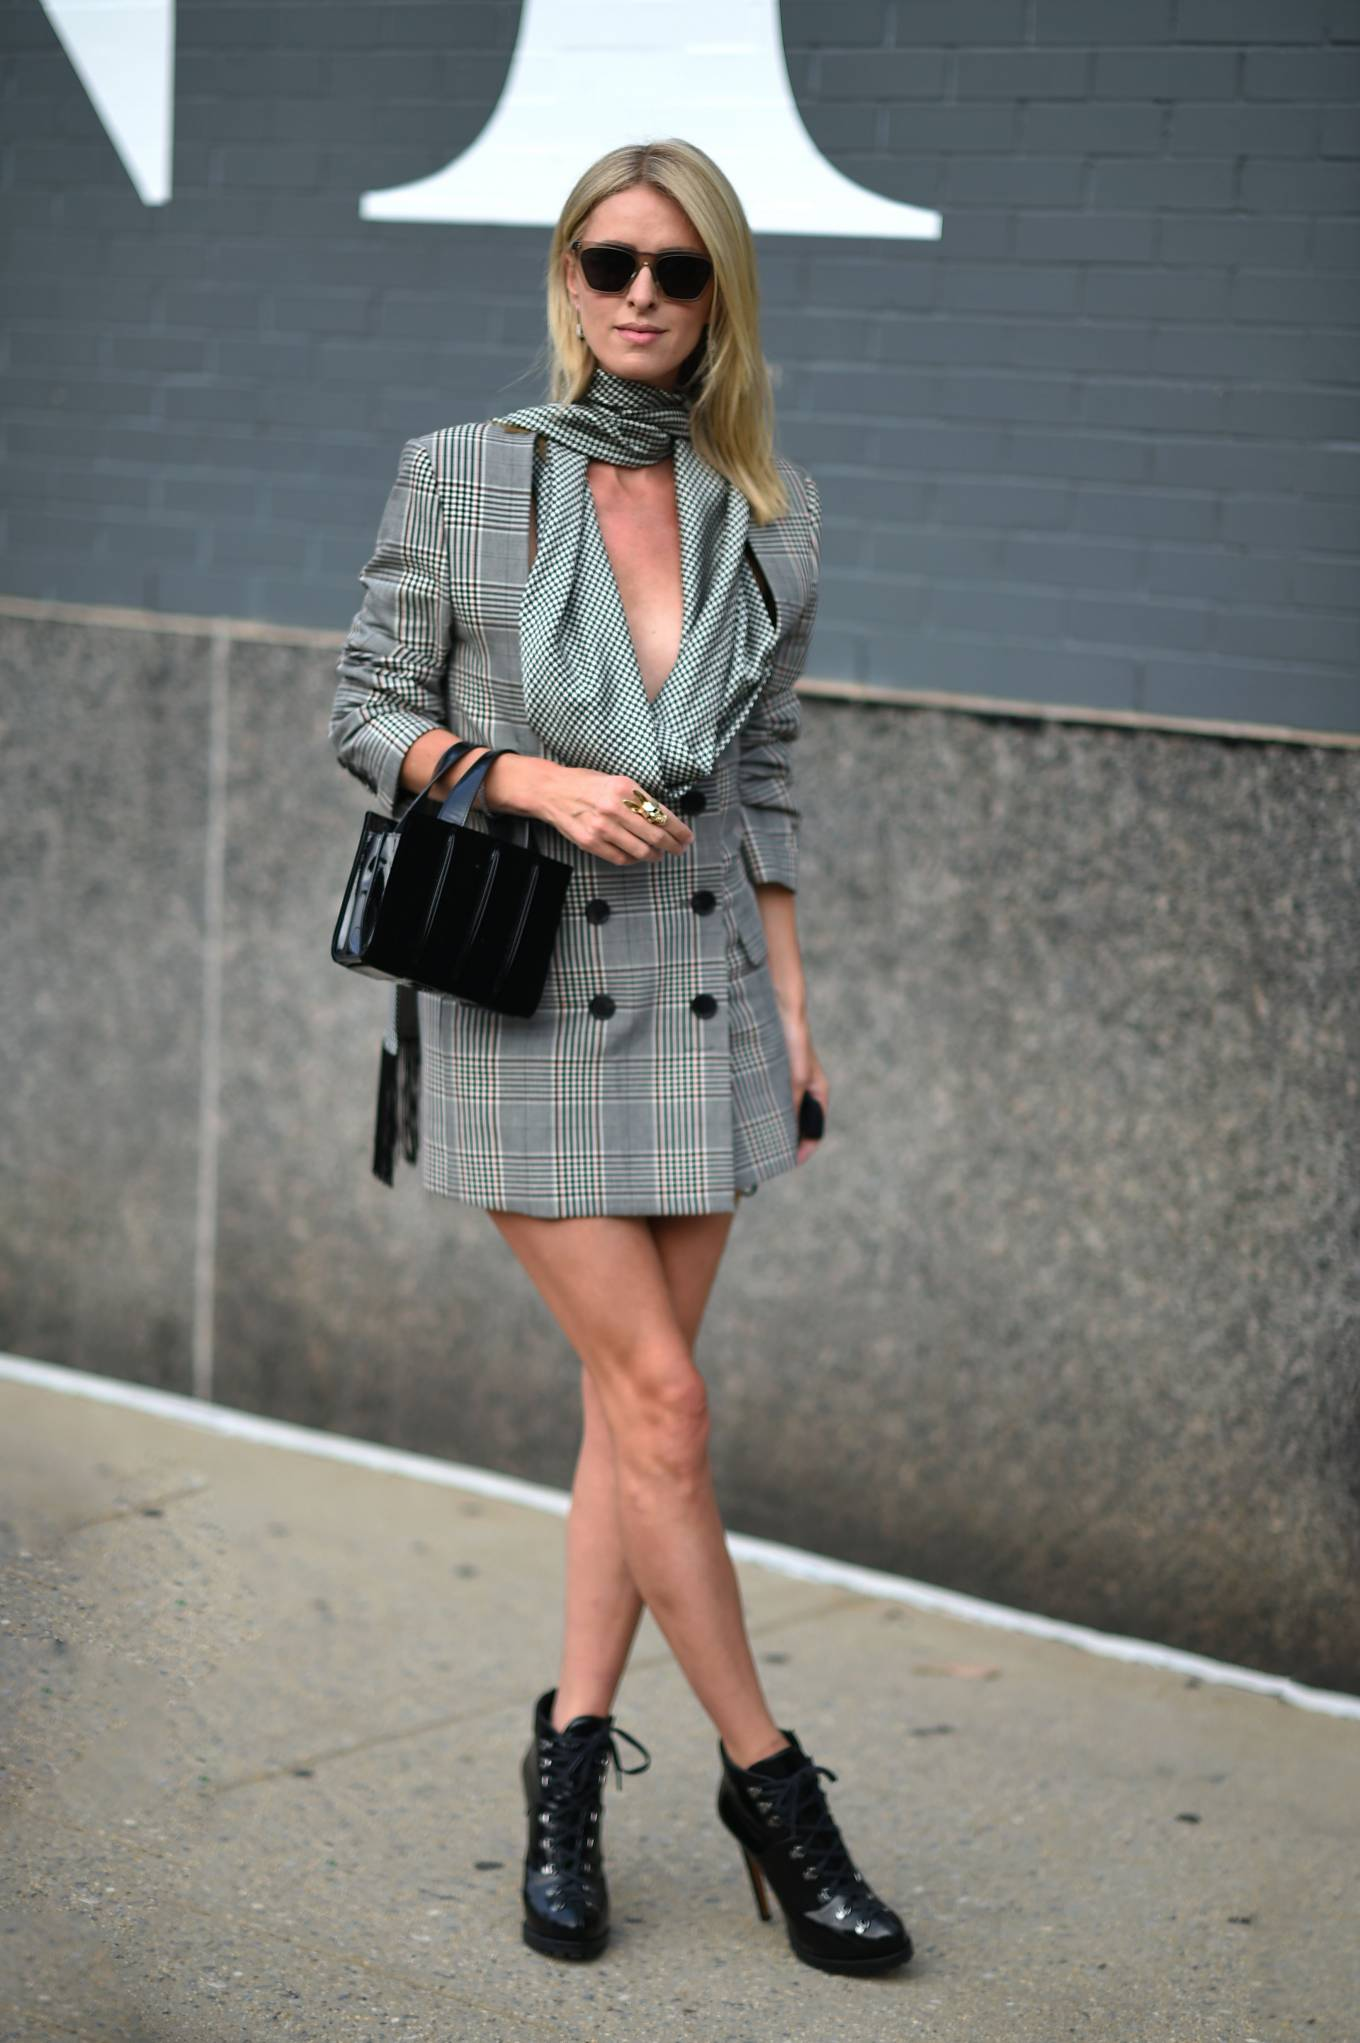 Nicky Hilton 2020 : Nicky Hilton – New York Fashion Week – Monse Fall-Winter 2020 Presentation-01